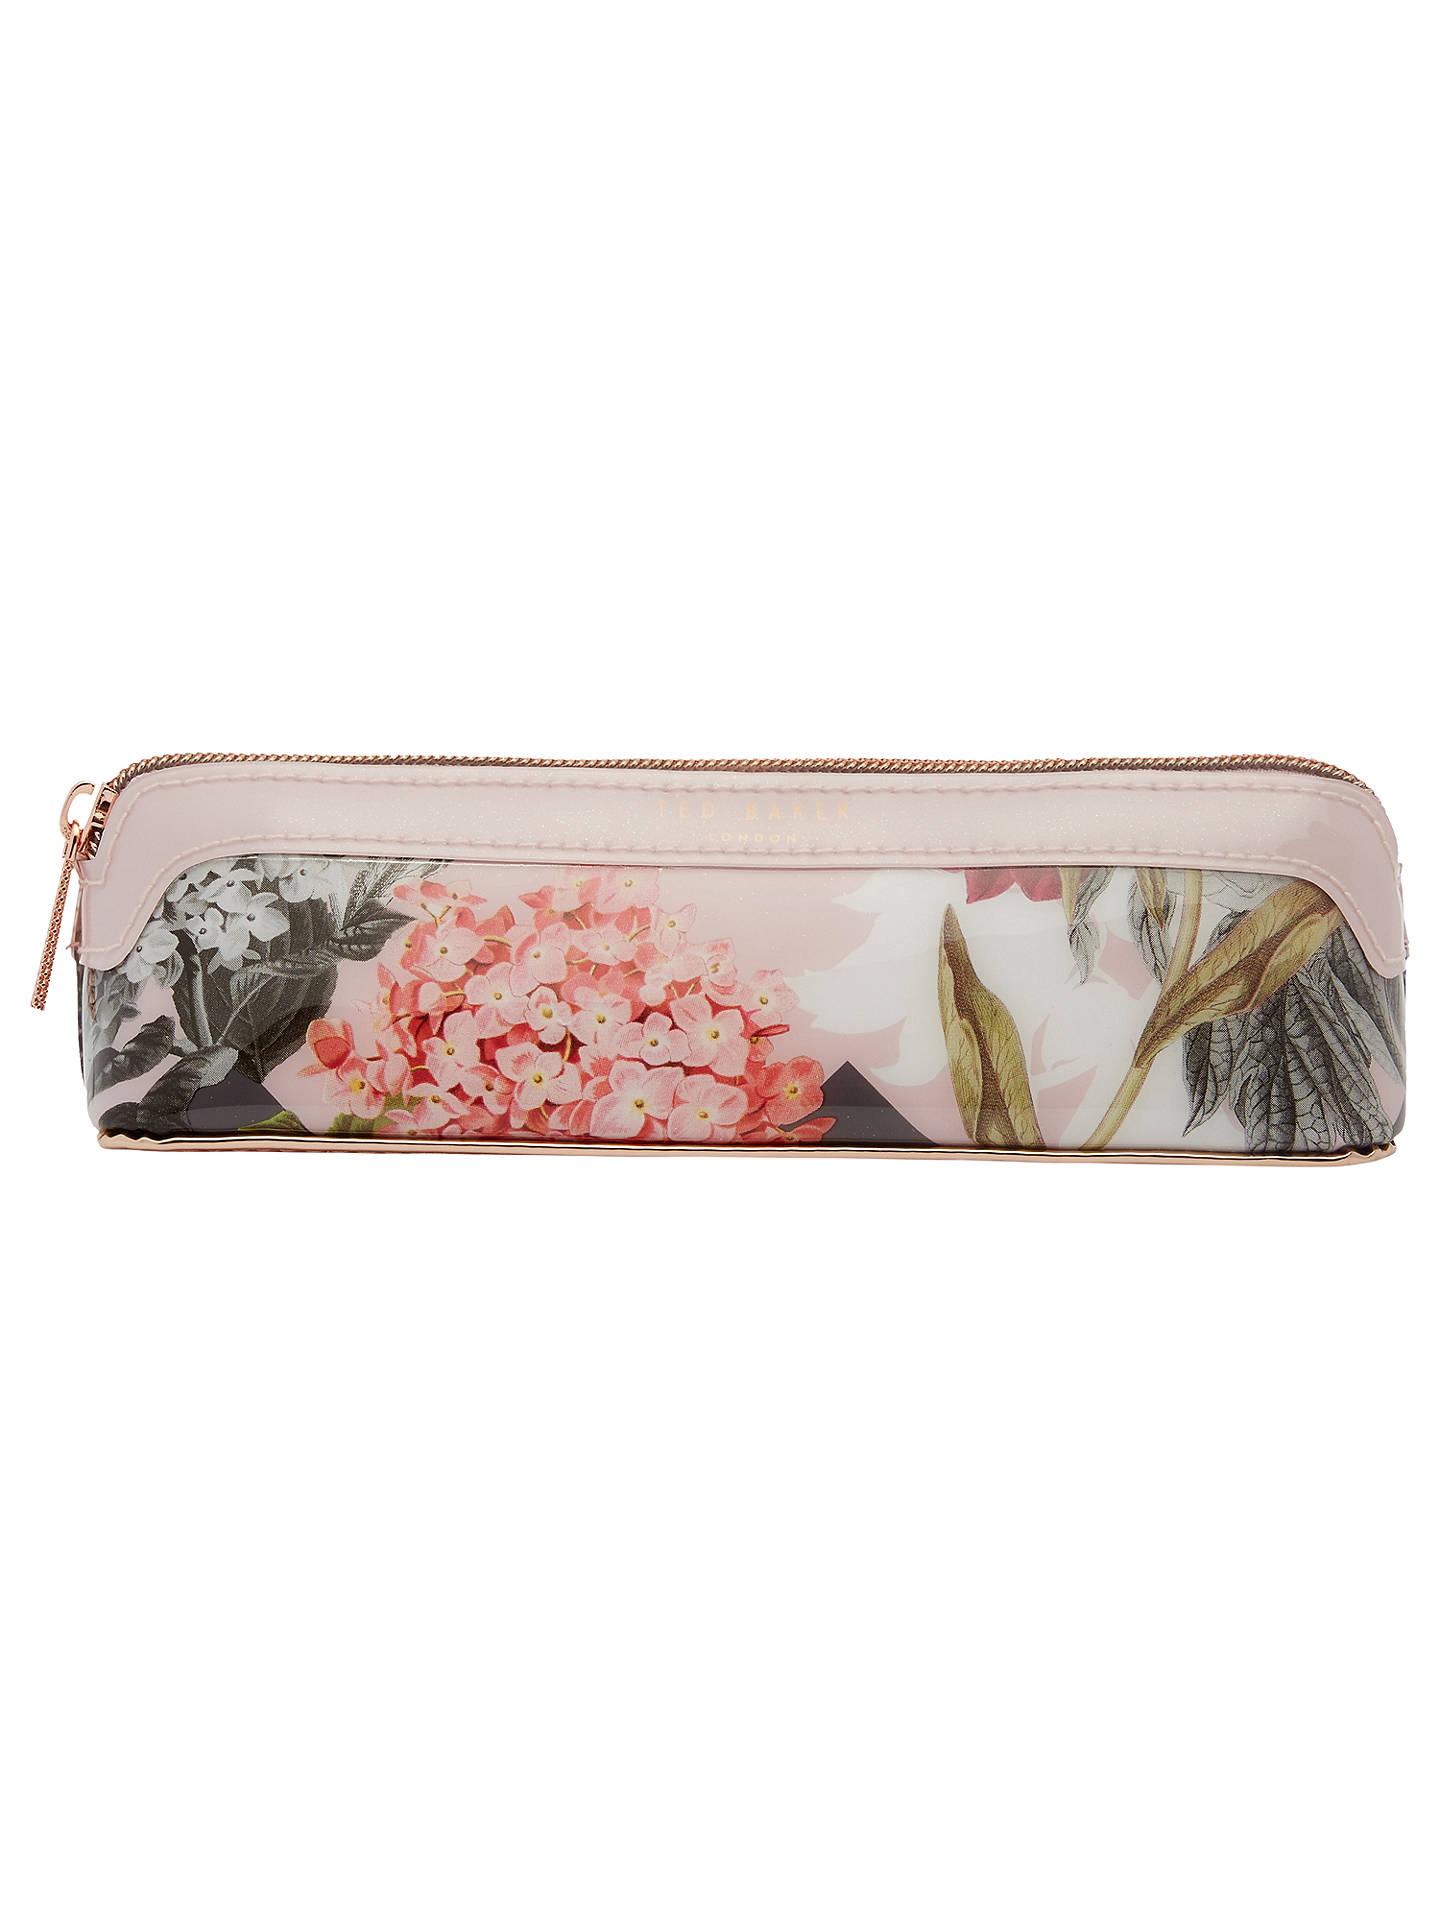 on sale 58de1 4ed89 Ted Baker Isle Palace Gardens Pencil Case, Dusky Pink